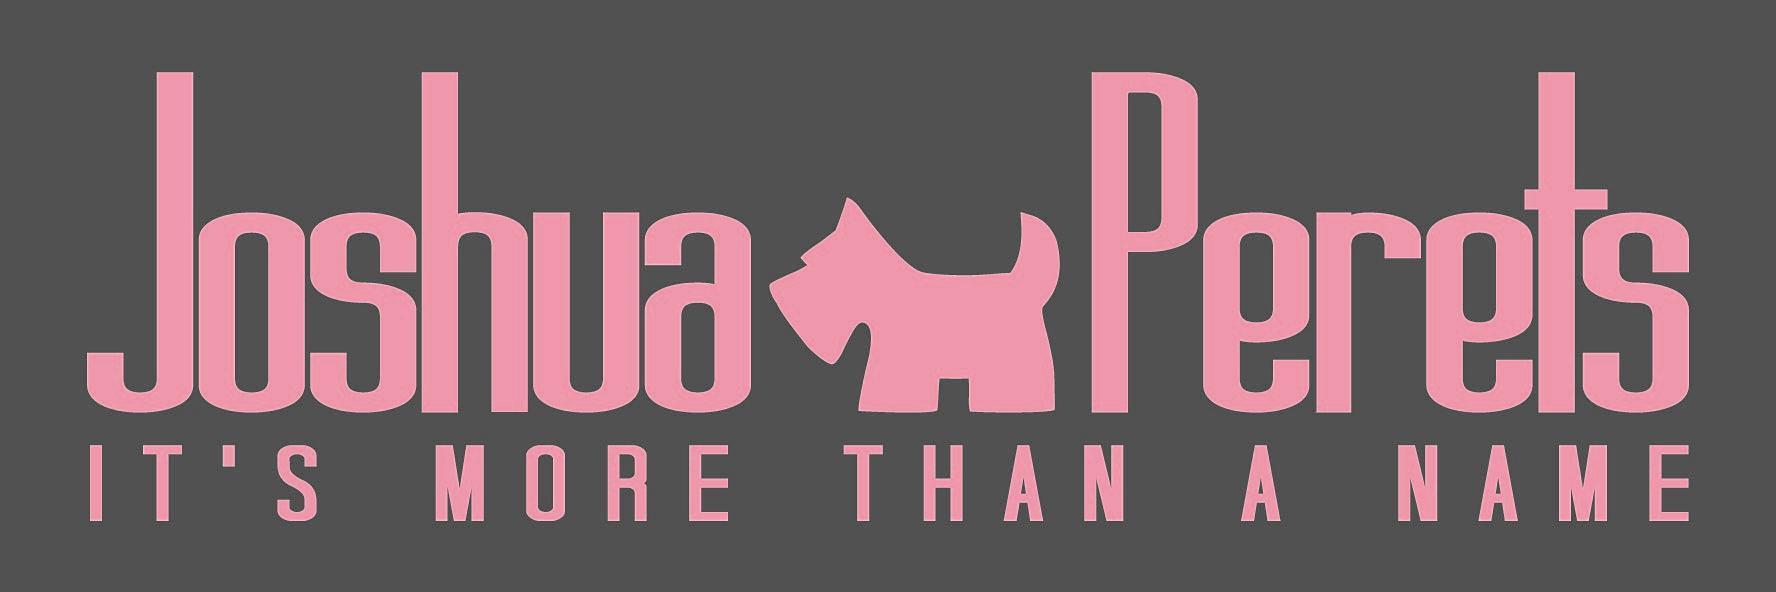 Joshua Perets Black Friday 2013 Deals And Savings Canada